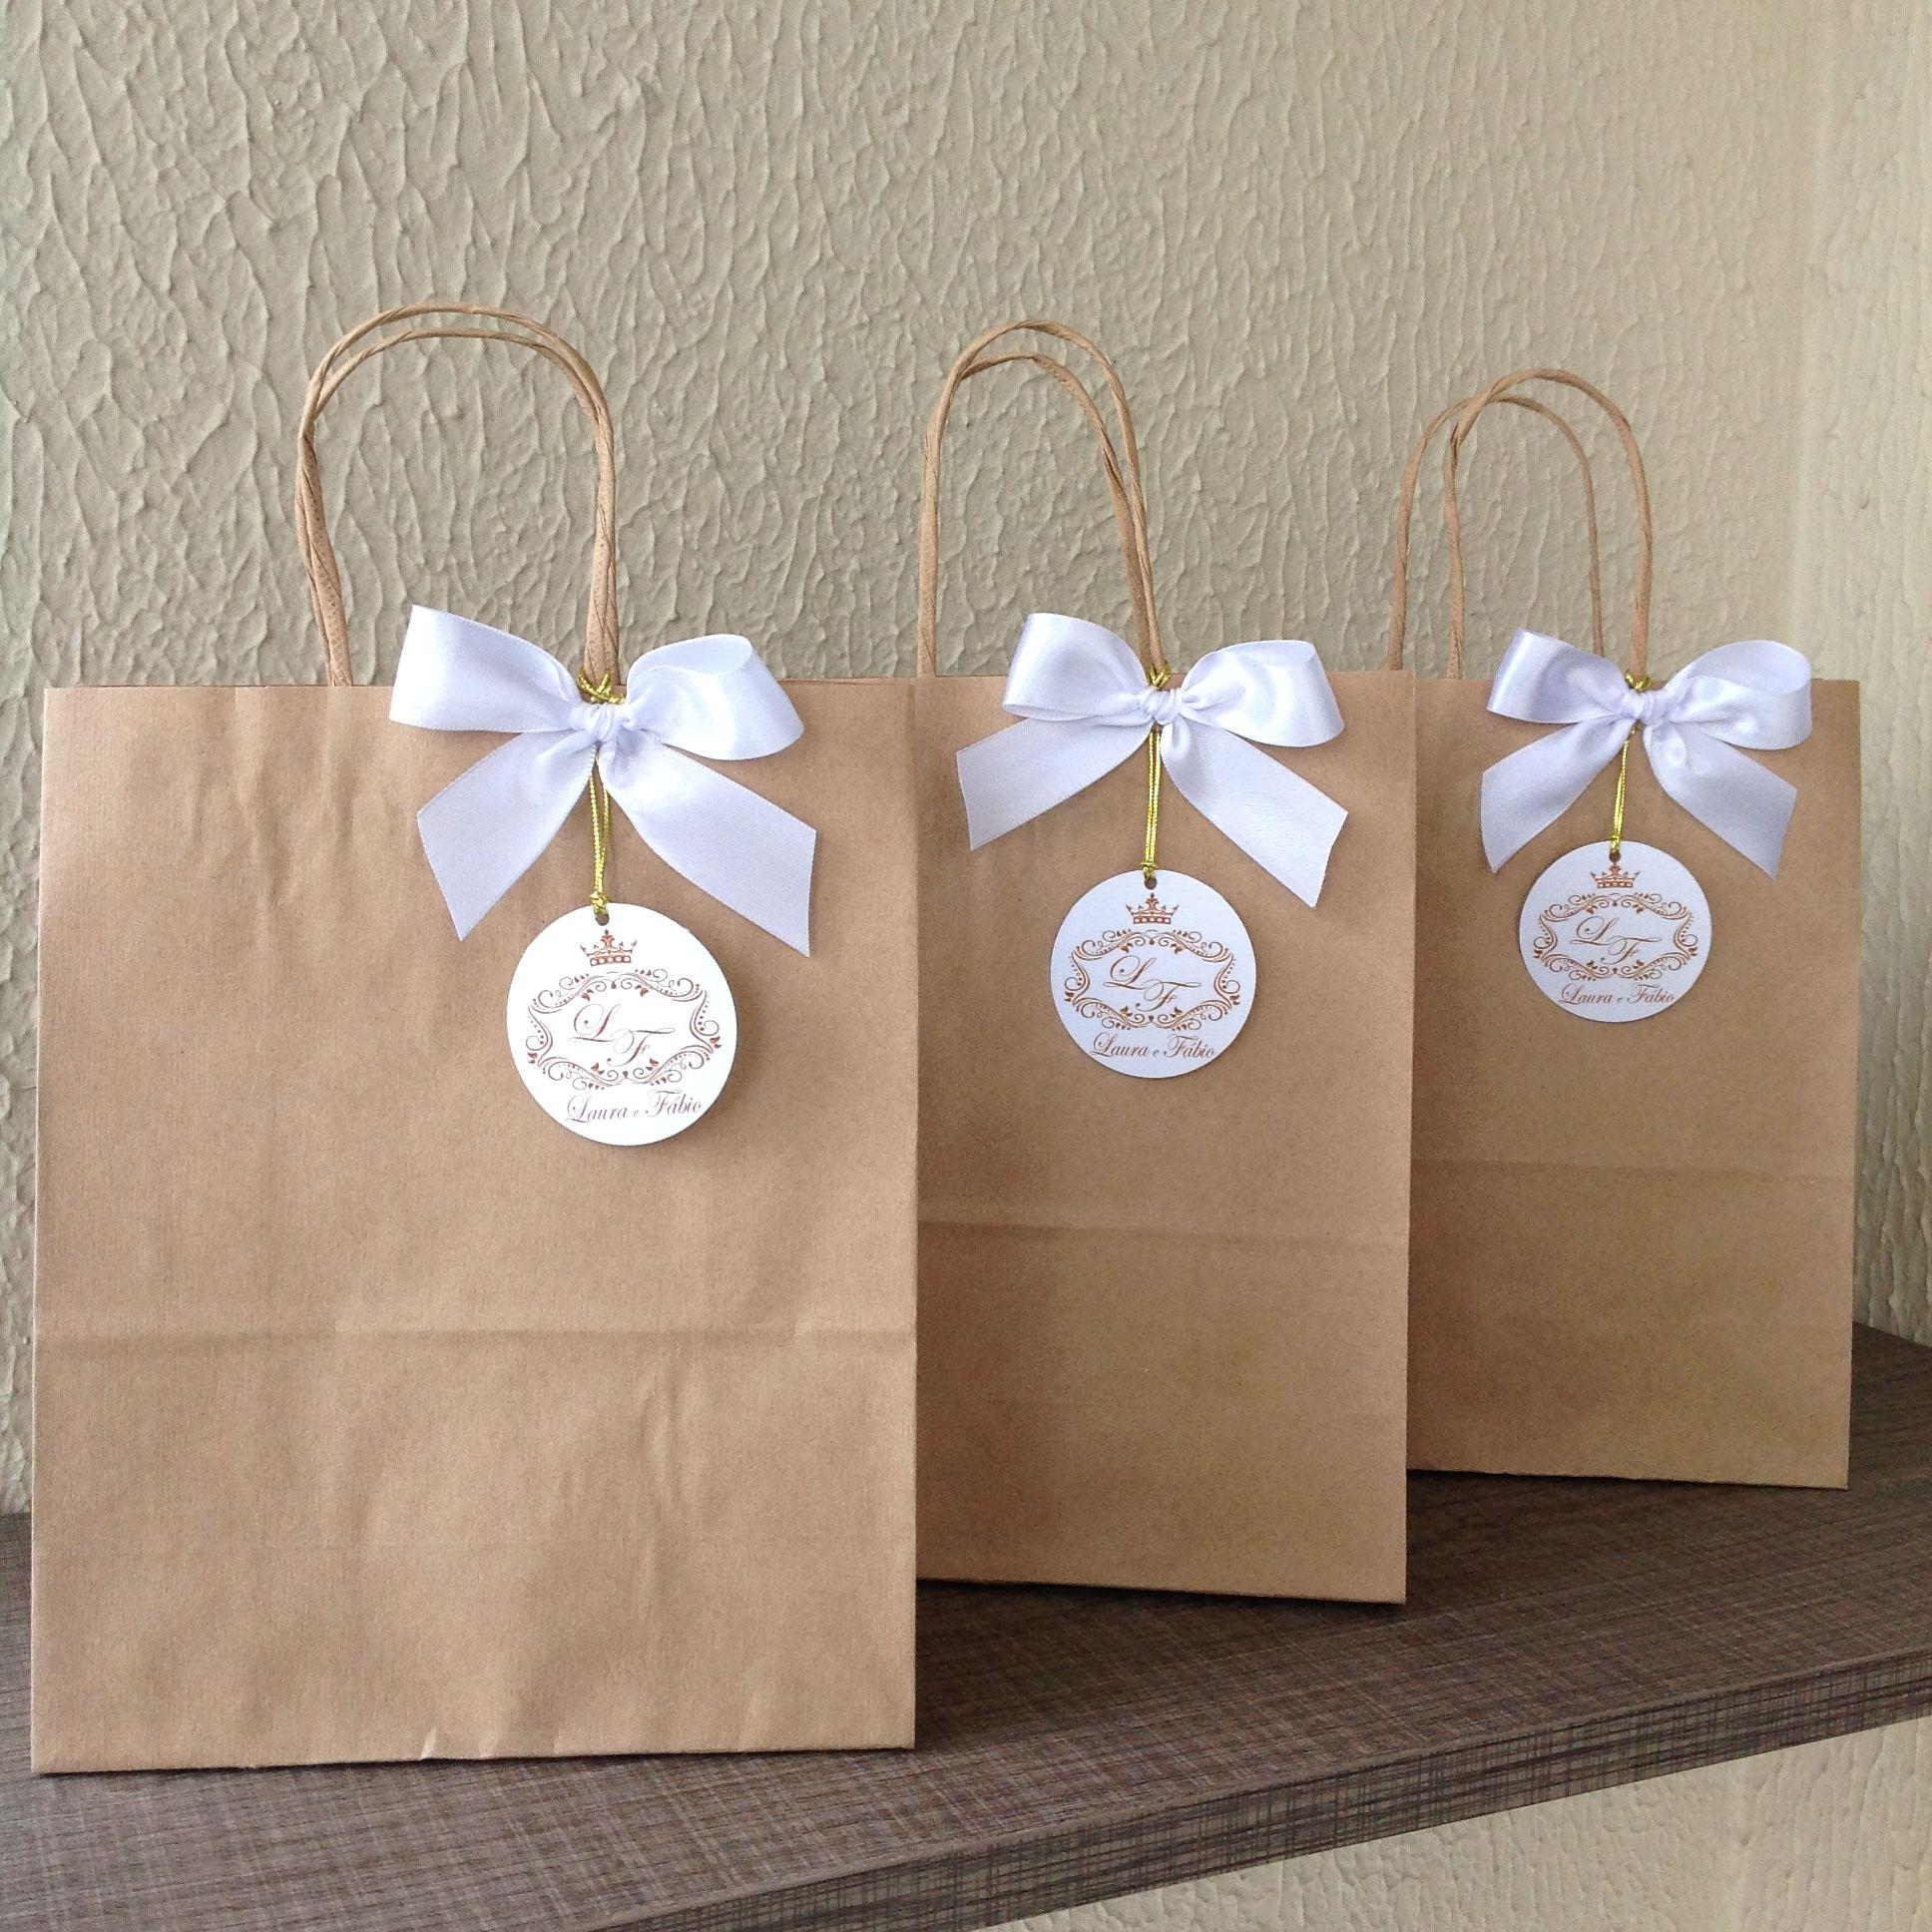 Bolsa De Papel Personalizada Casamento : Resultado de imagem para sacola papel personalizada